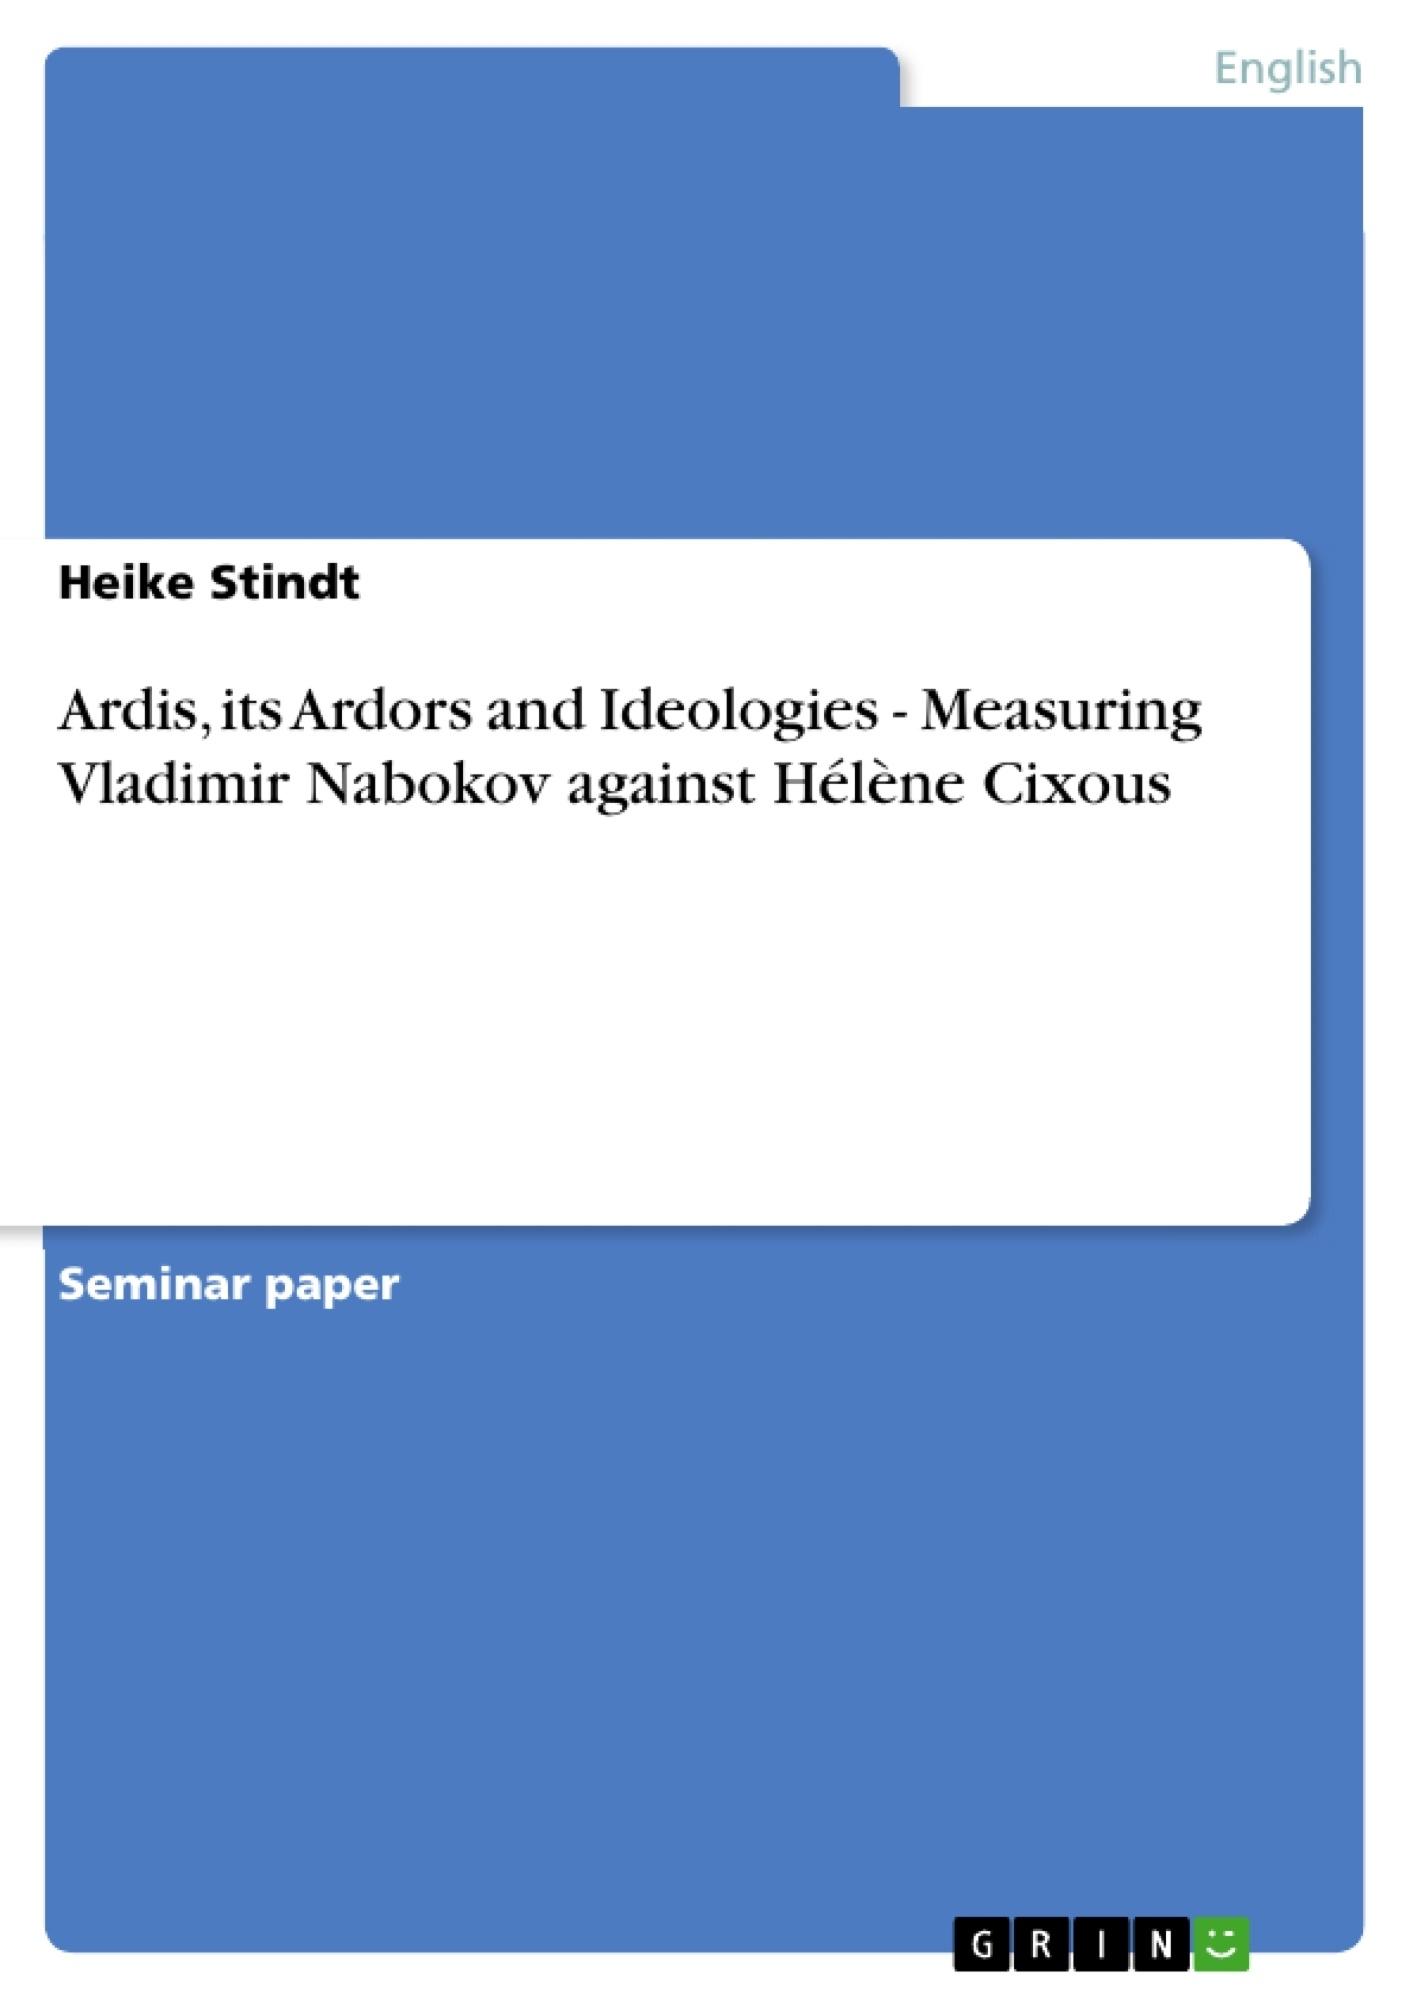 Title: Ardis, its Ardors and Ideologies - Measuring Vladimir Nabokov against Hélène Cixous